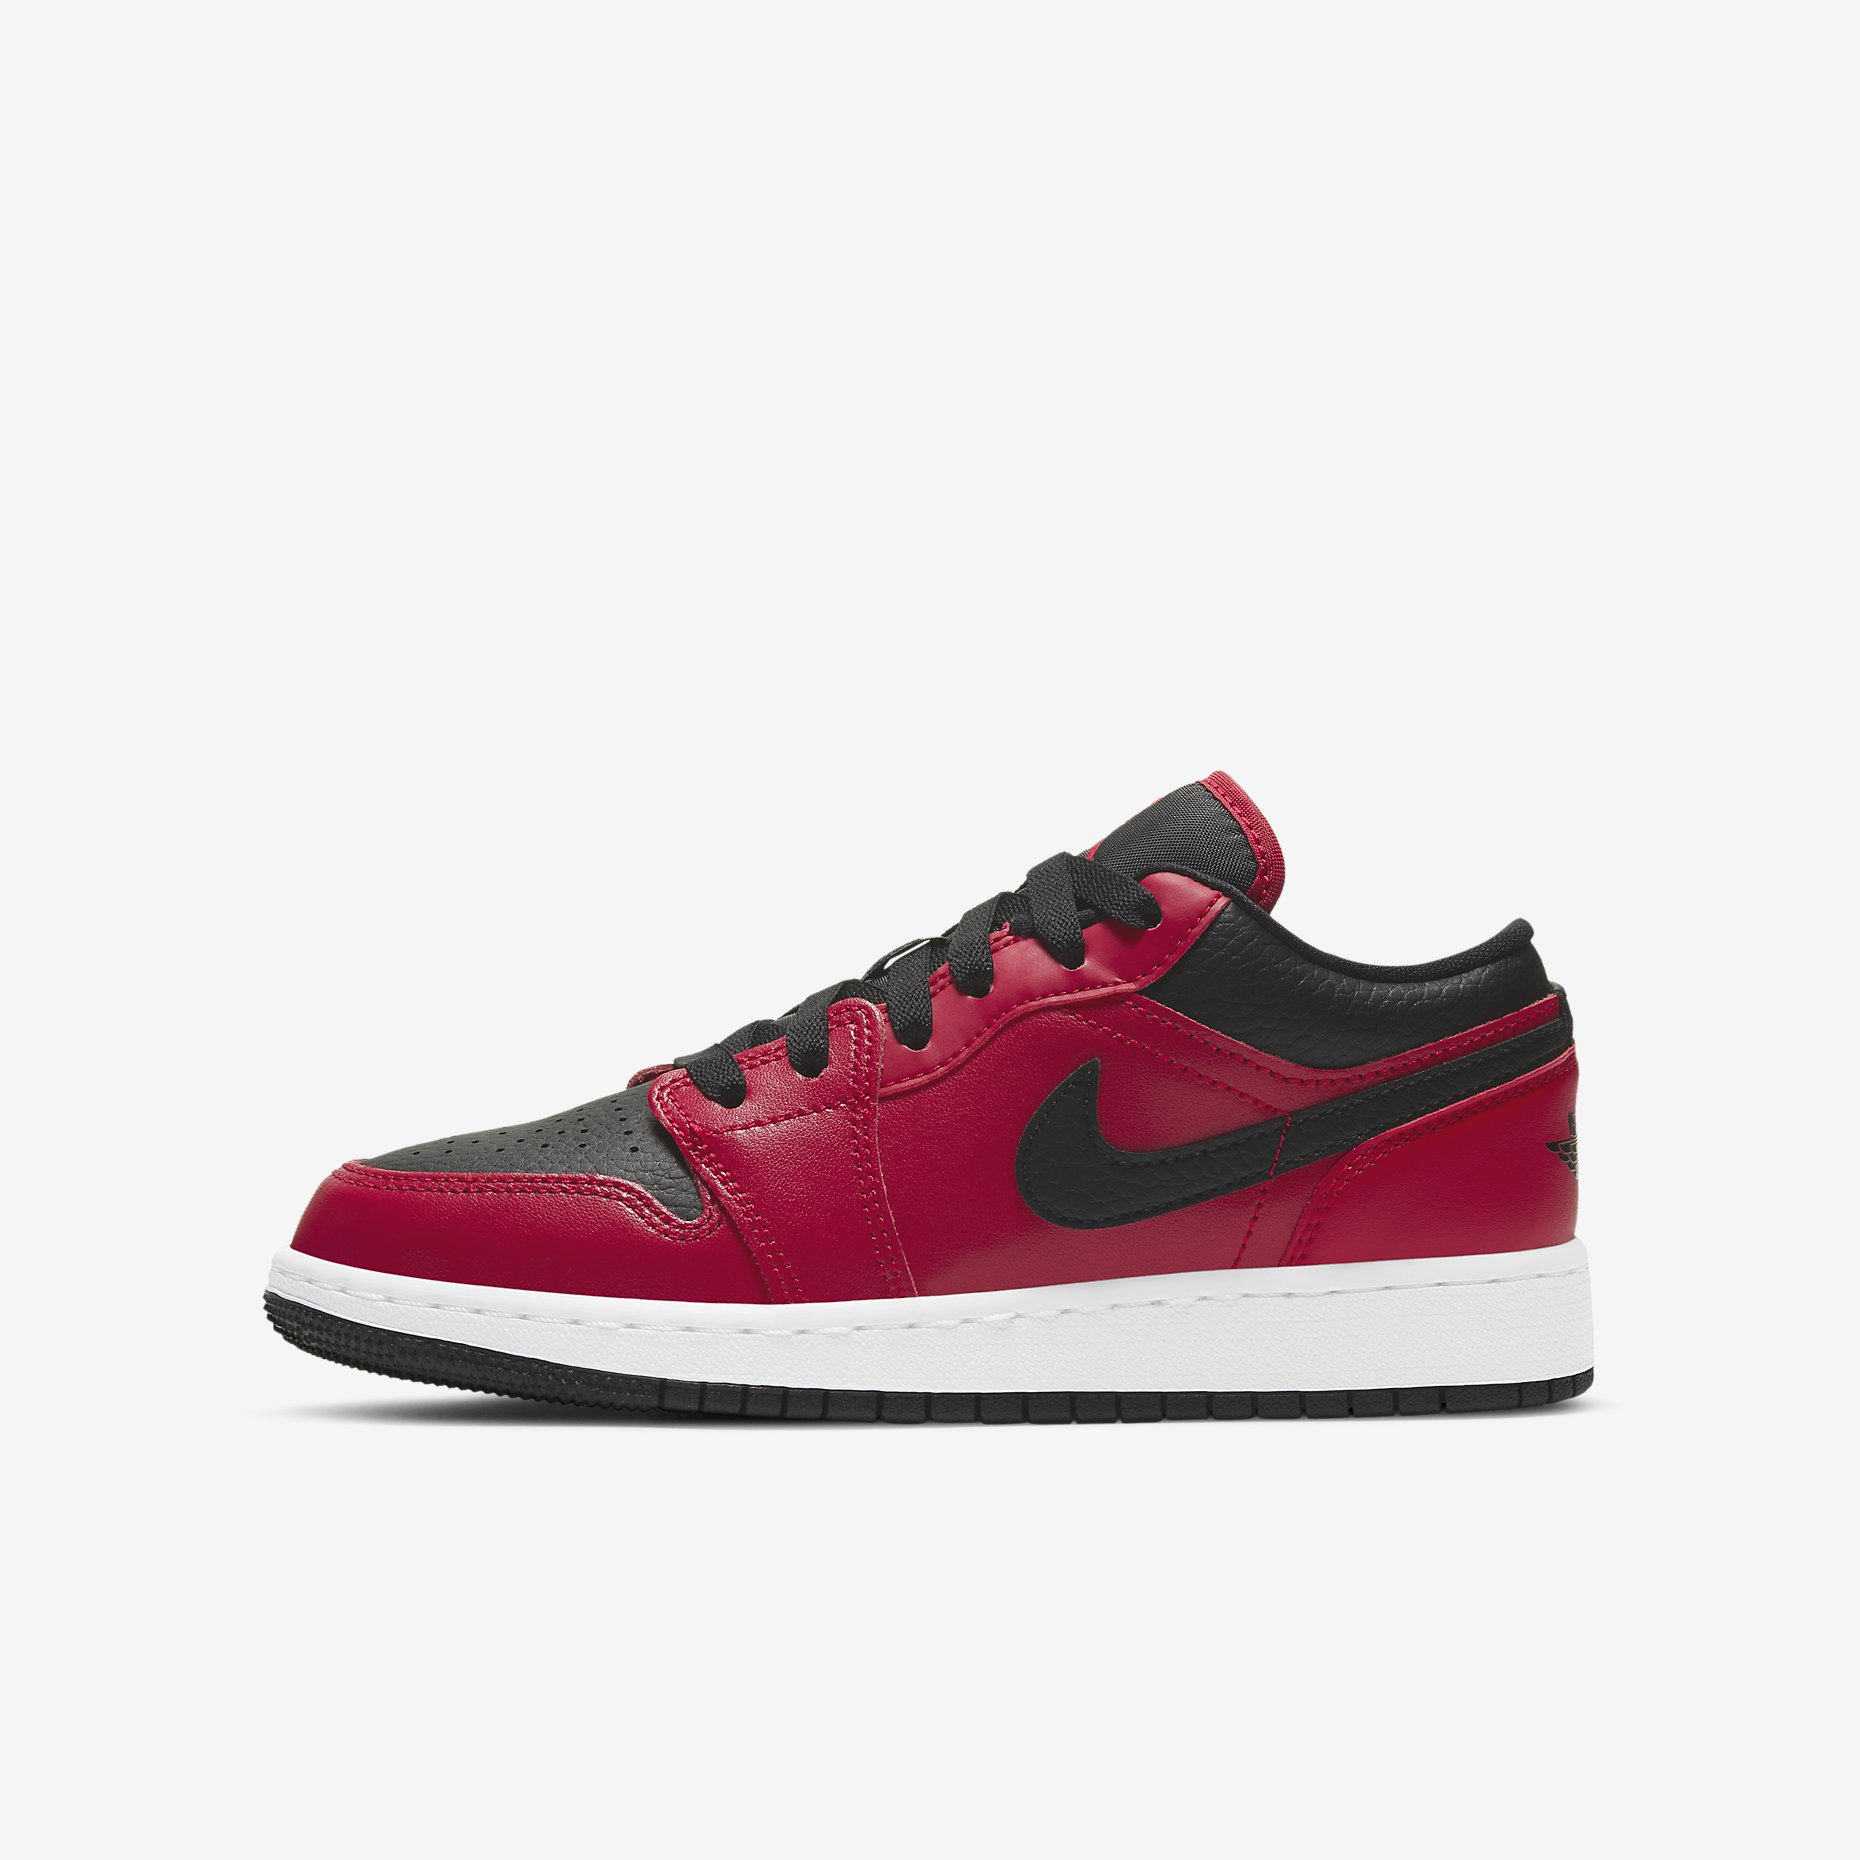 Air Jordan 1 Low GS 'Gym Red/Black'}